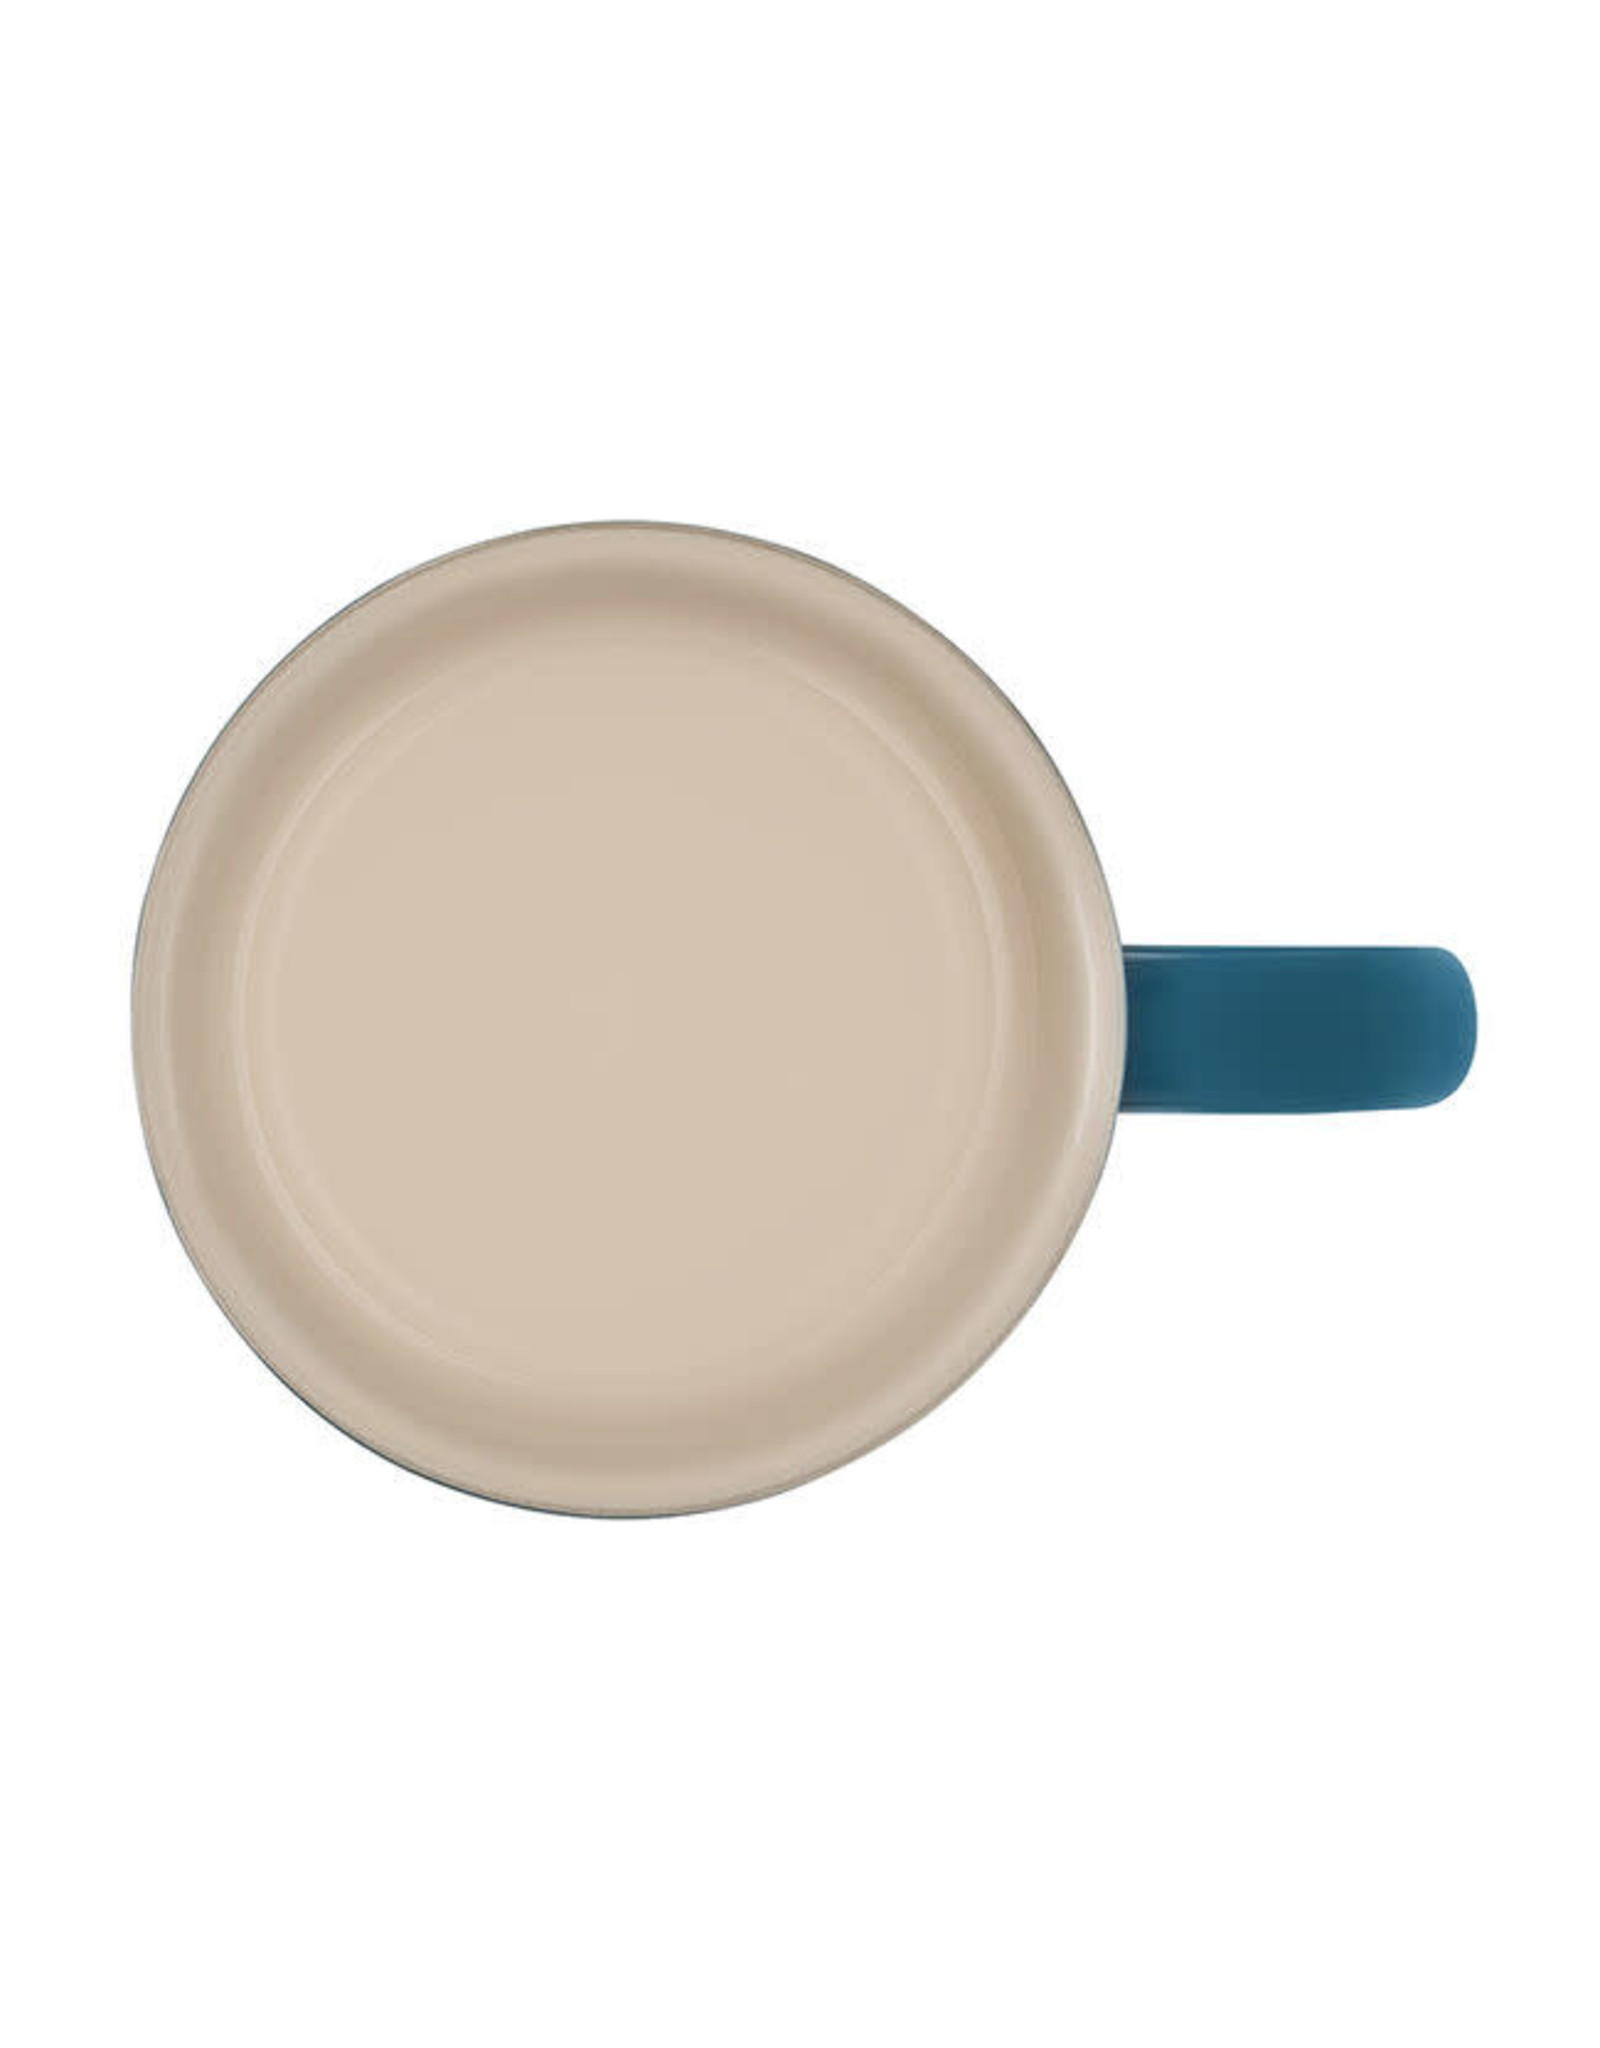 Le Creuset LE CREUSET- Coffee Mug 14oz deep teal